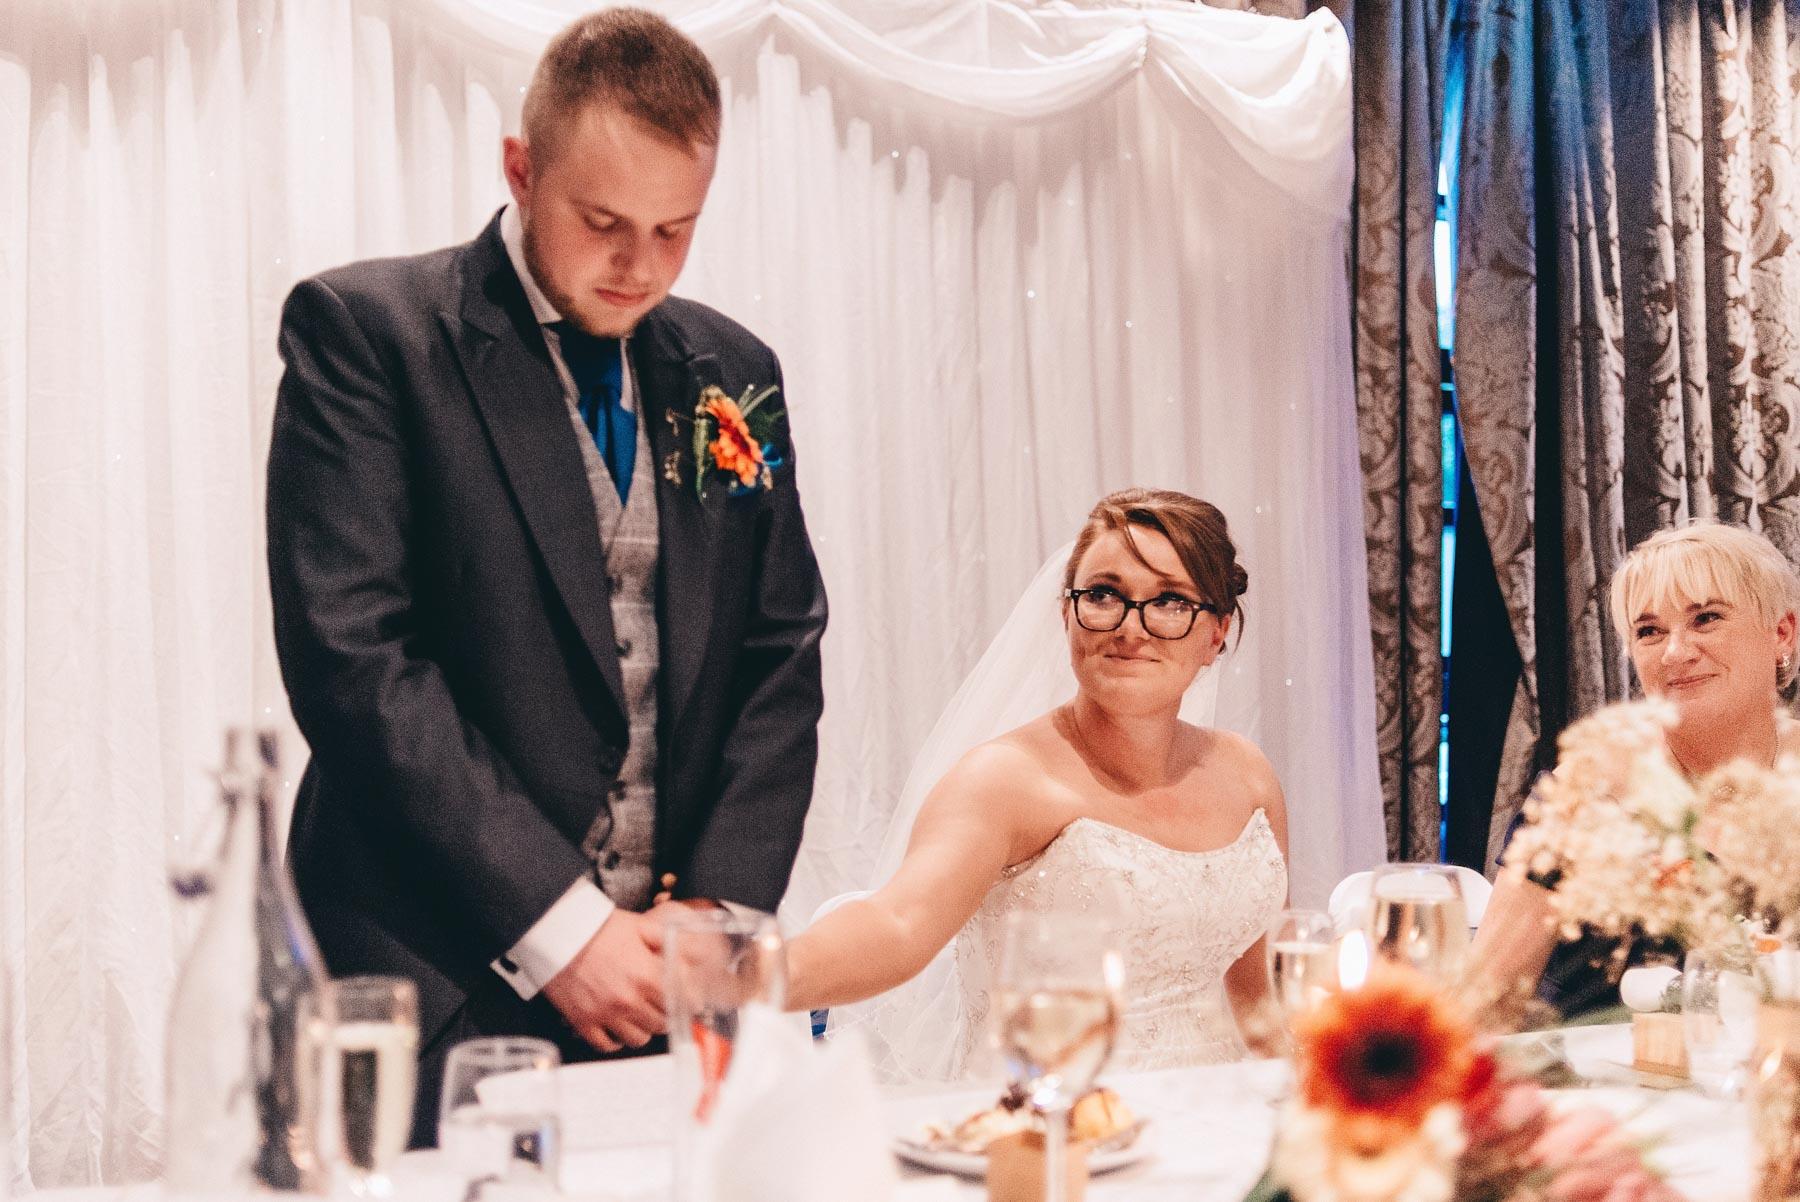 Bride looks at groom during emotional speech